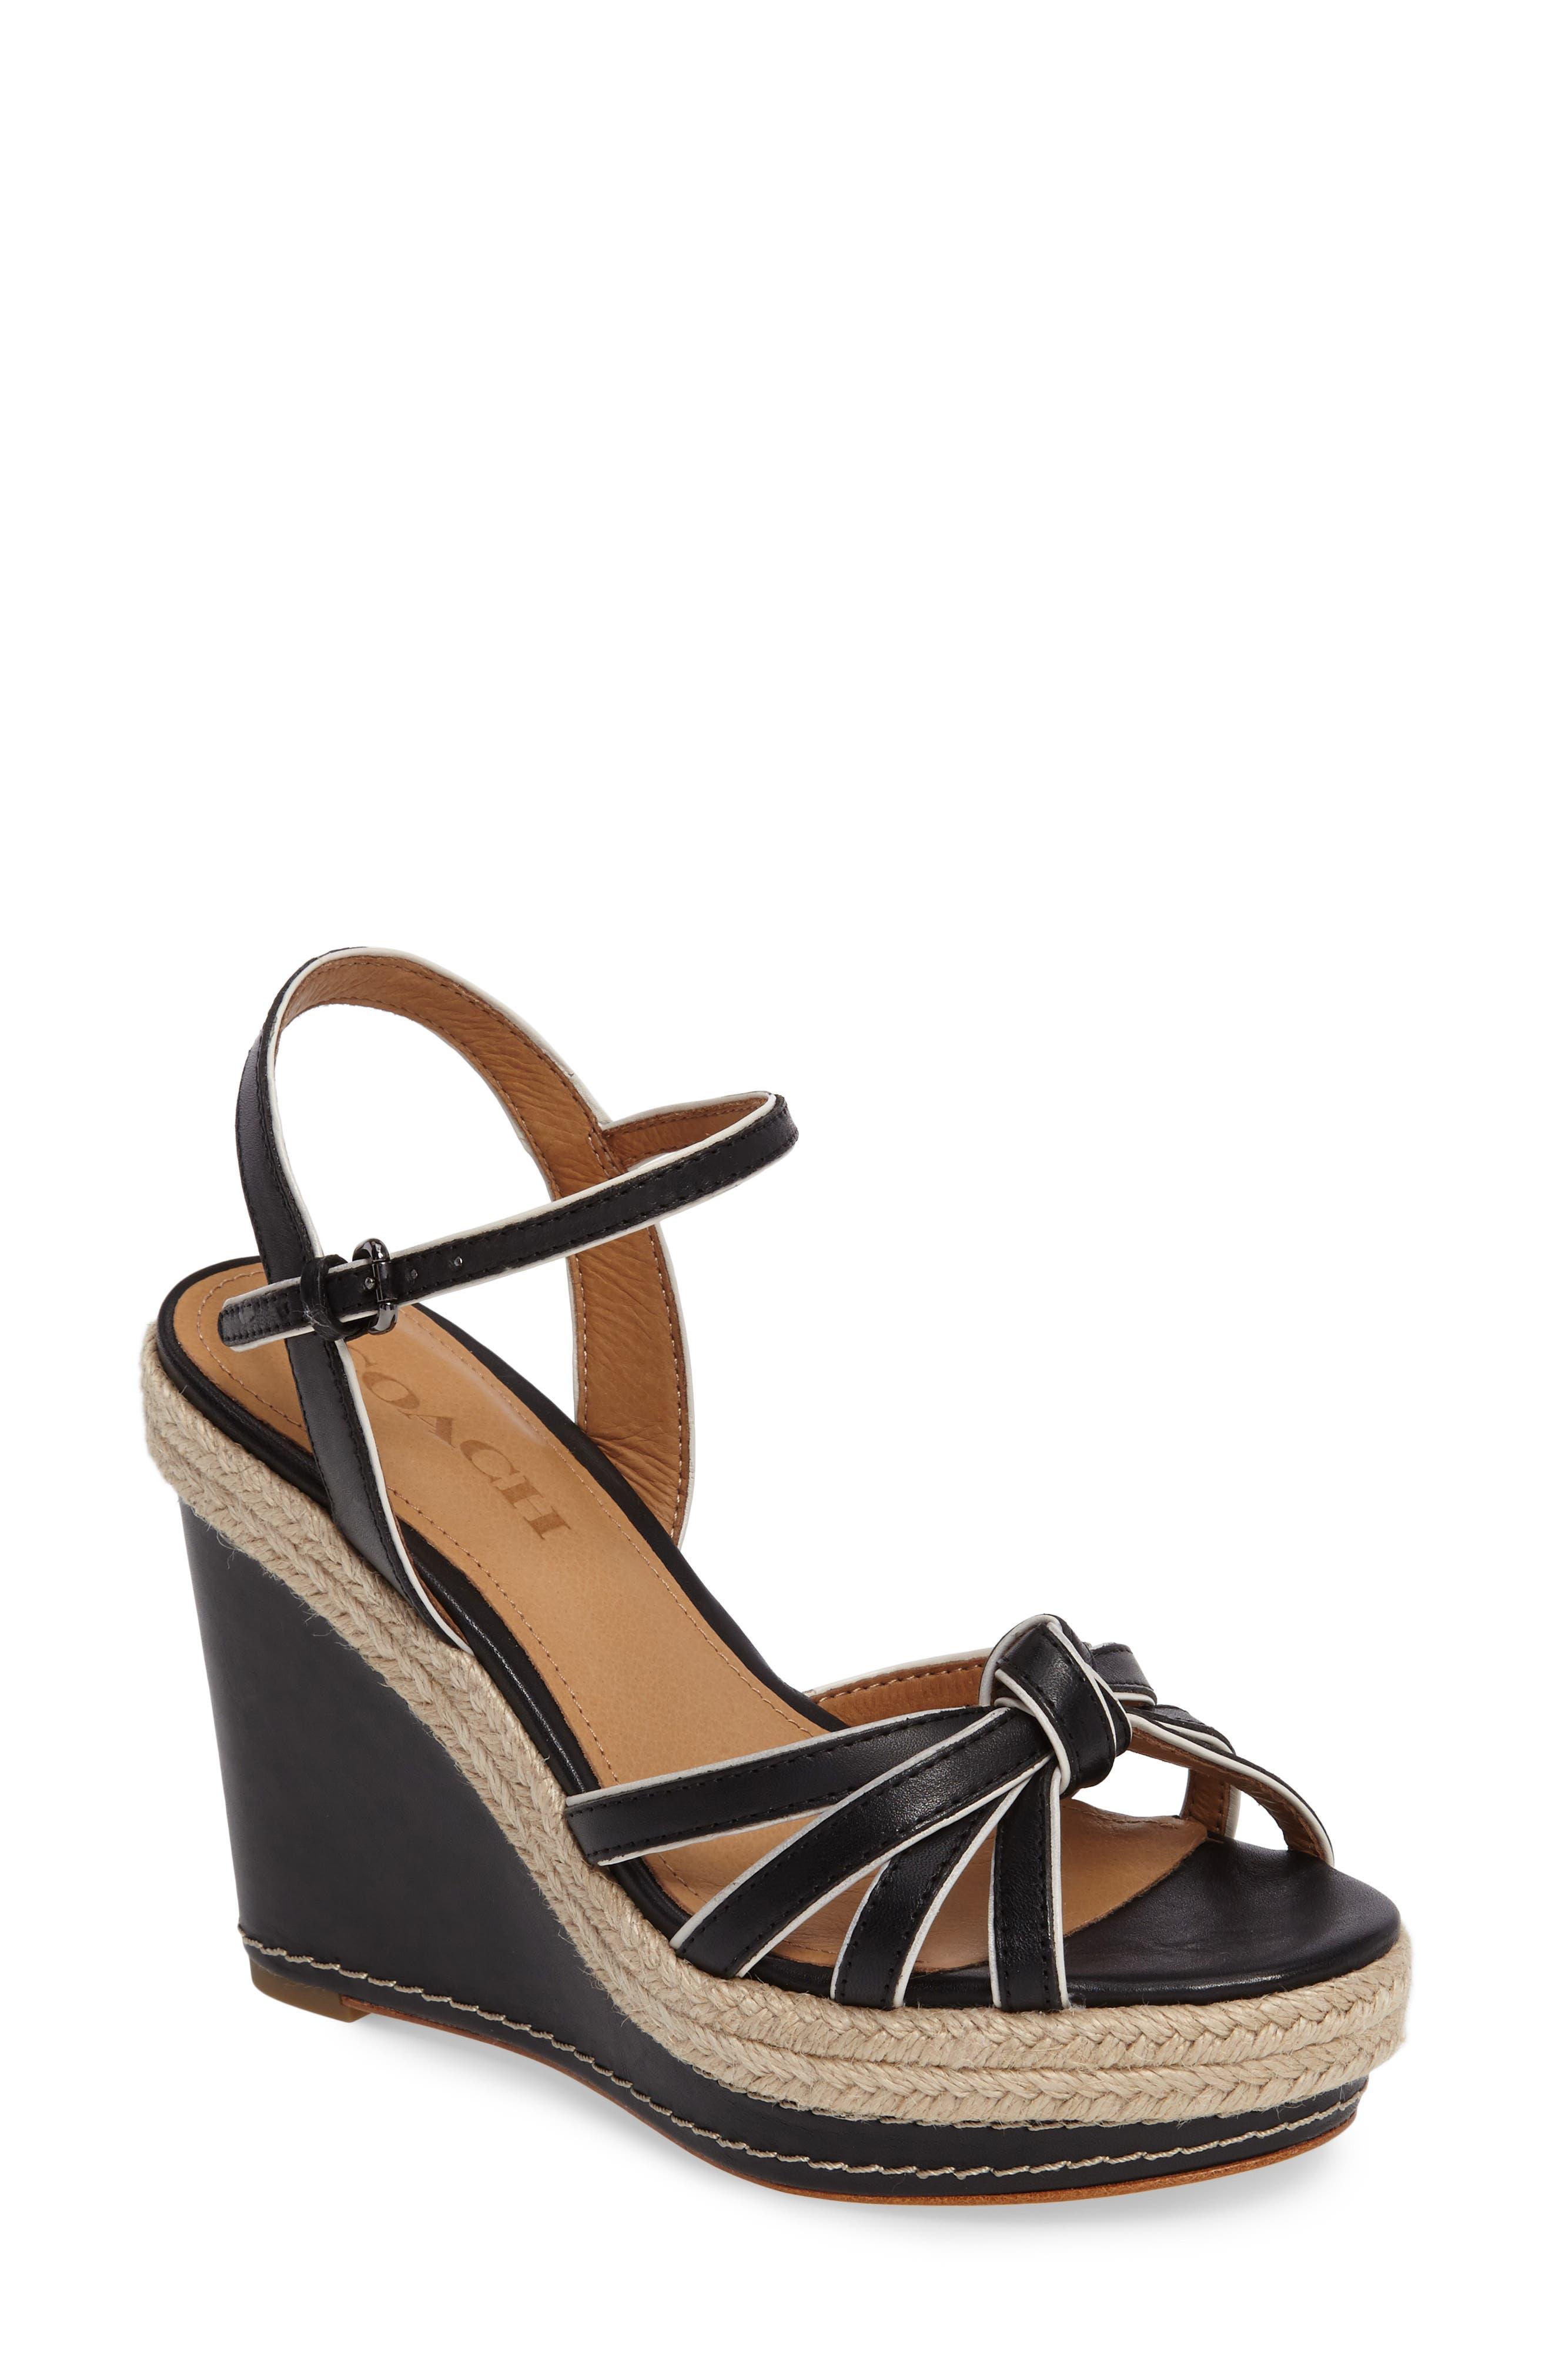 COACH Dalton Espadrille Wedge Sandal (Women)